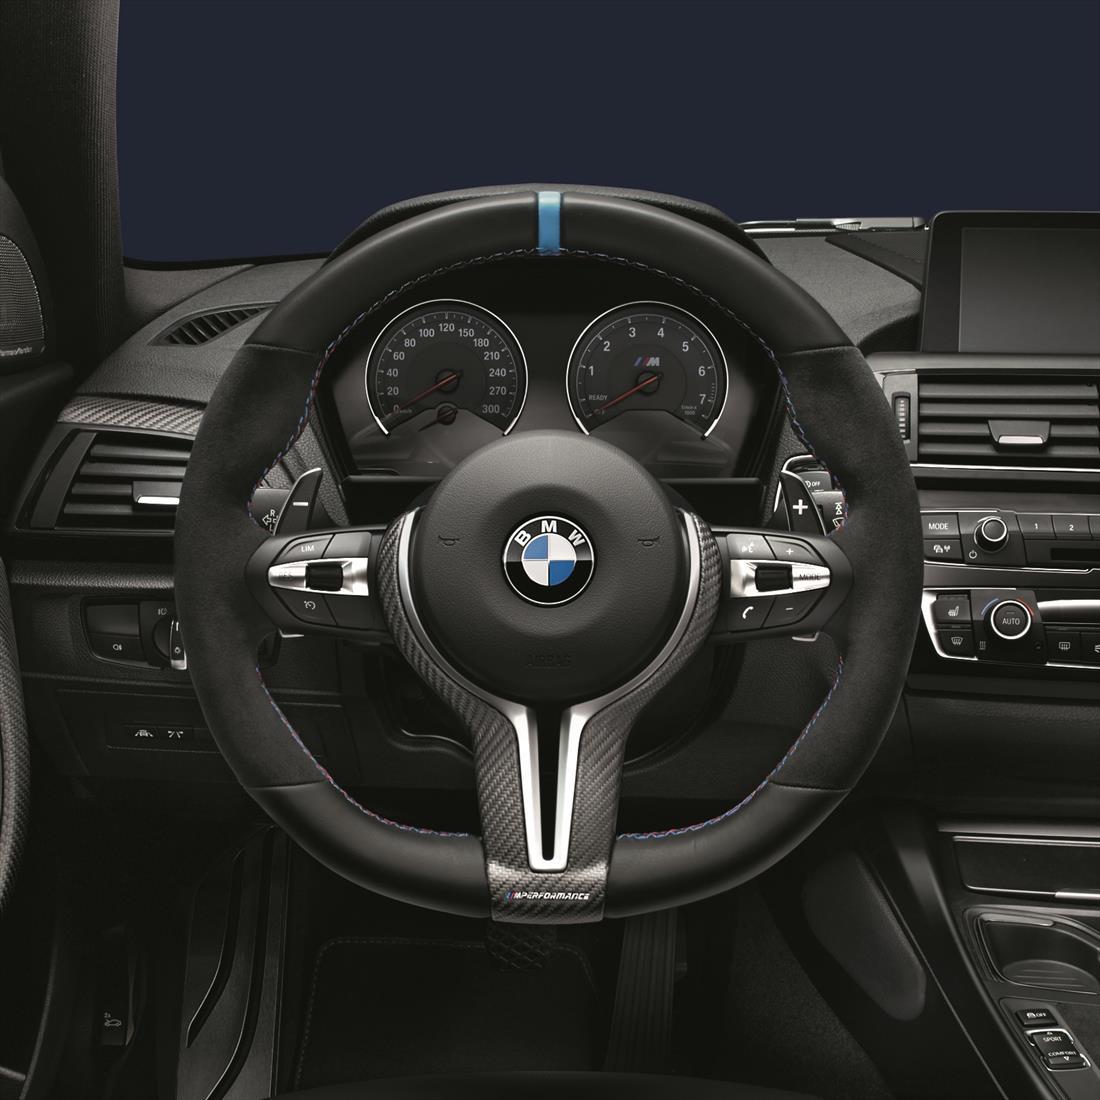 BMW M Performance Steering Wheel Pro